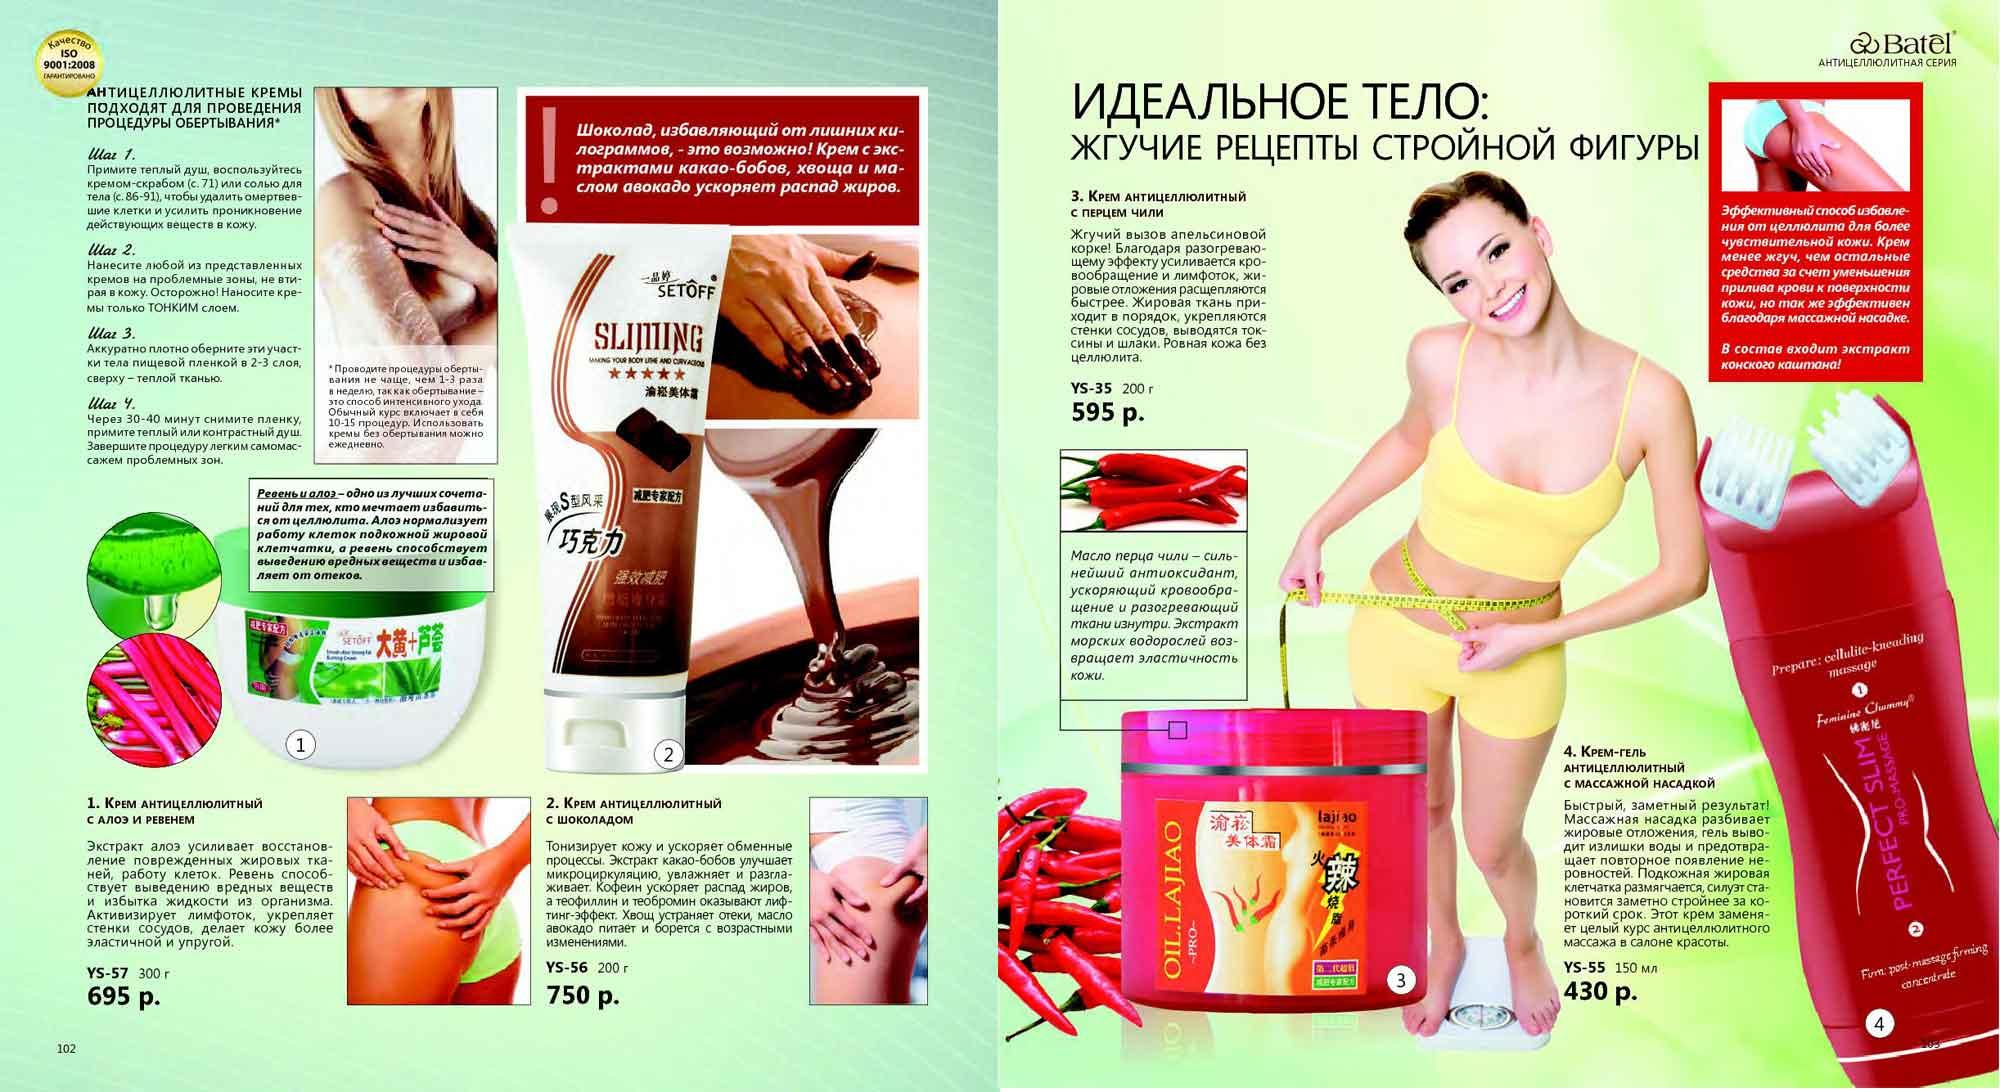 Рецепты Обертываний Для Похудения В Талии. Спа на дому: 5 обертываний для похудения живота